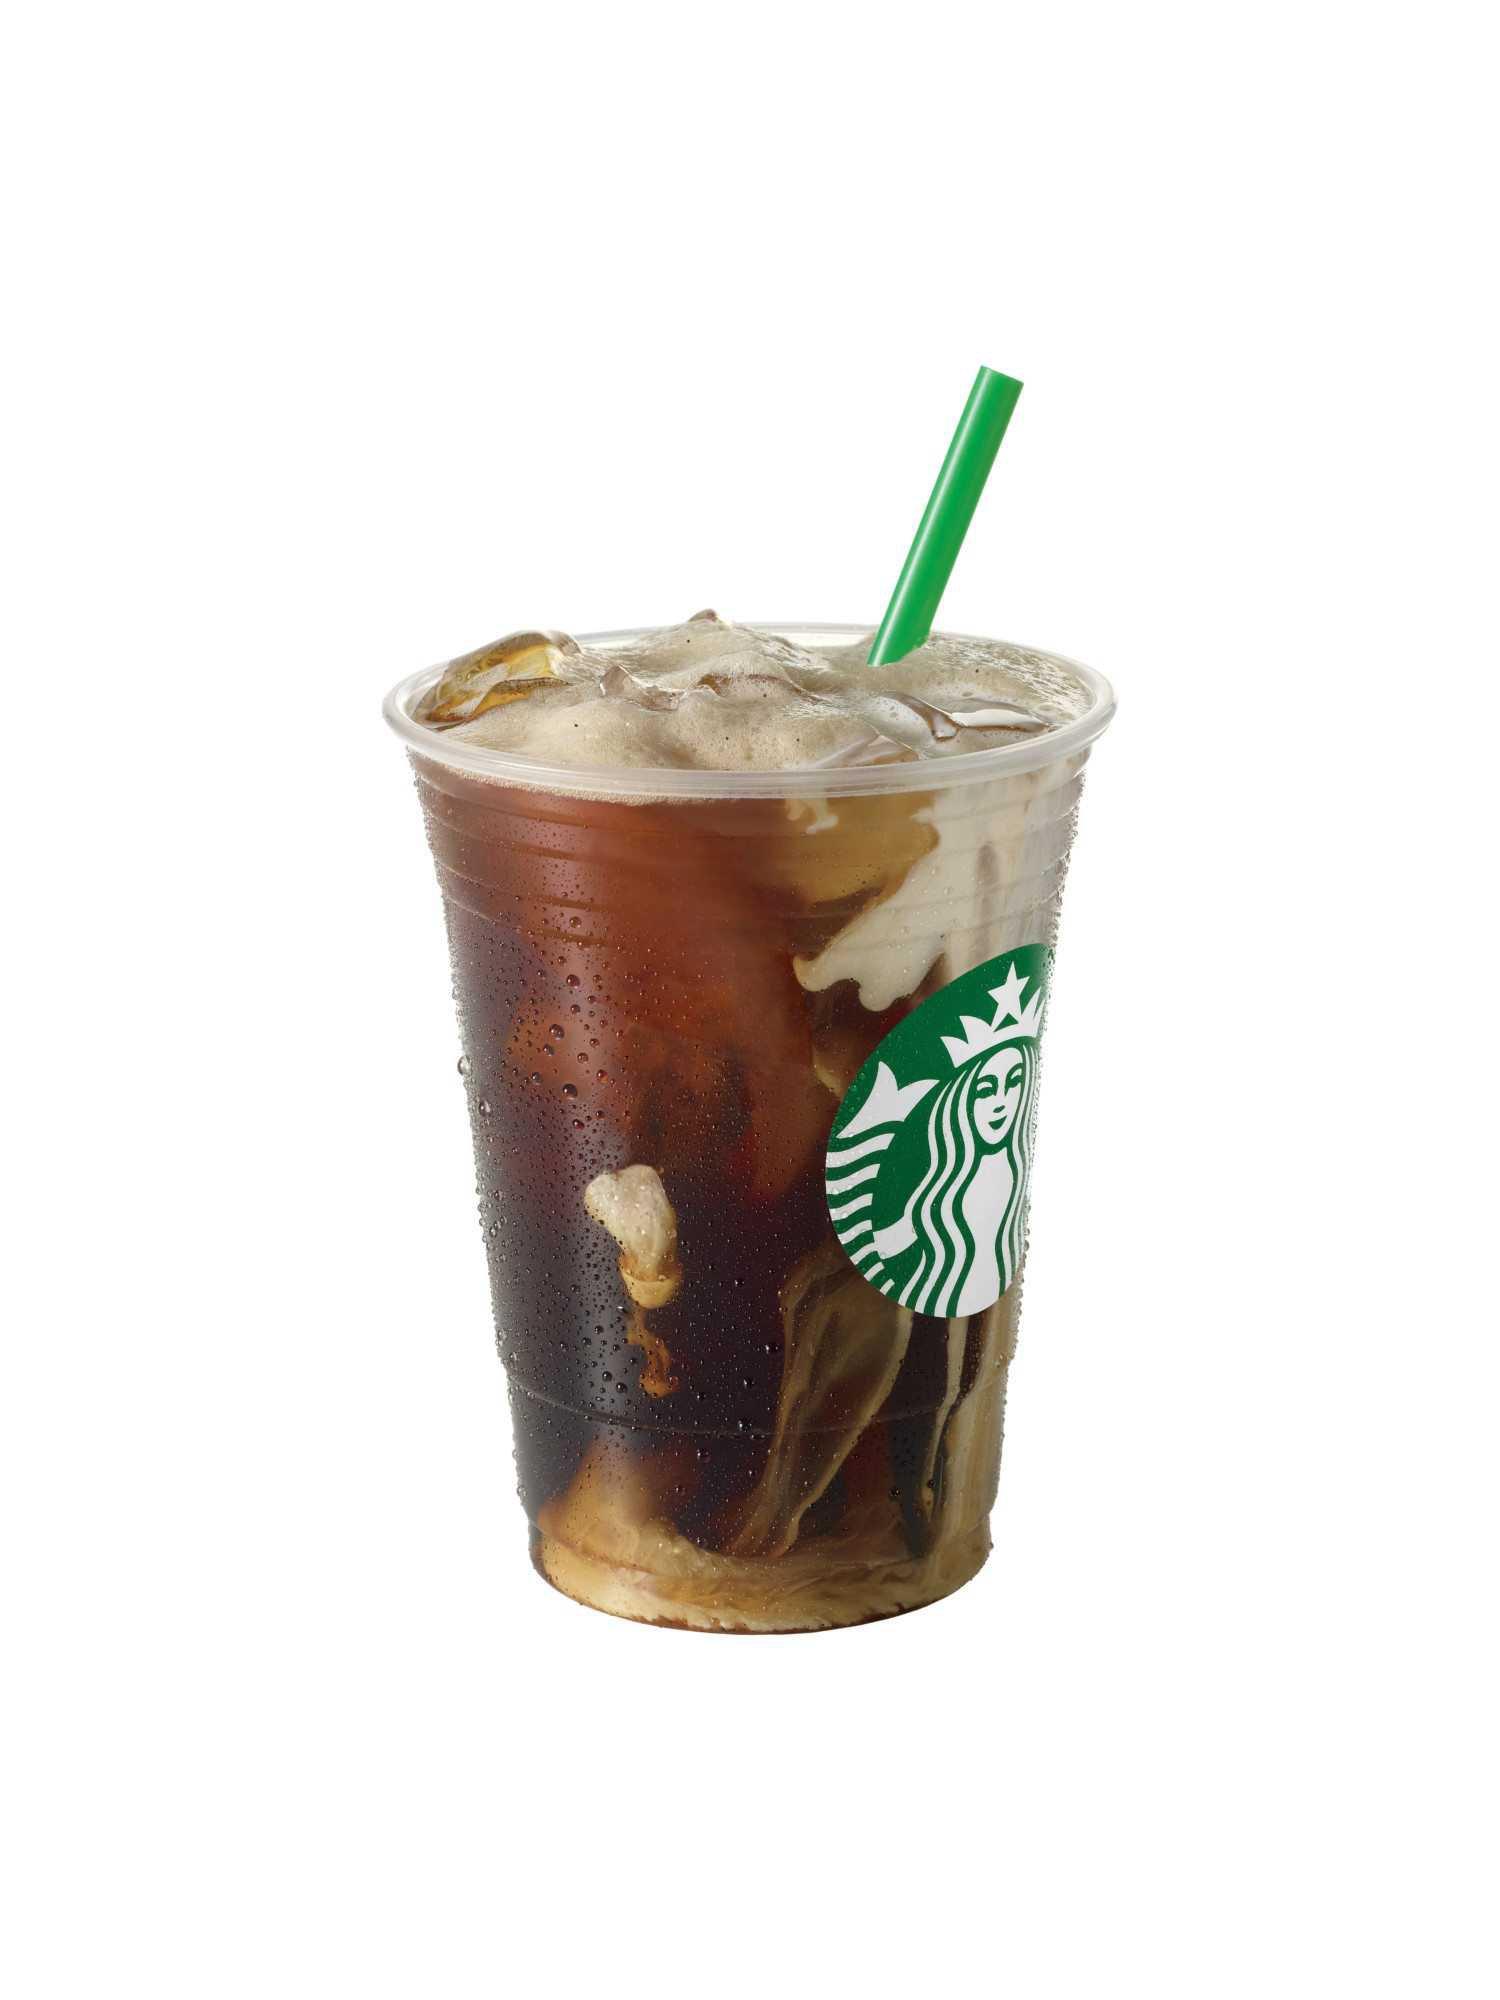 Starbucks Coffee Ice Cubes - Simplemost